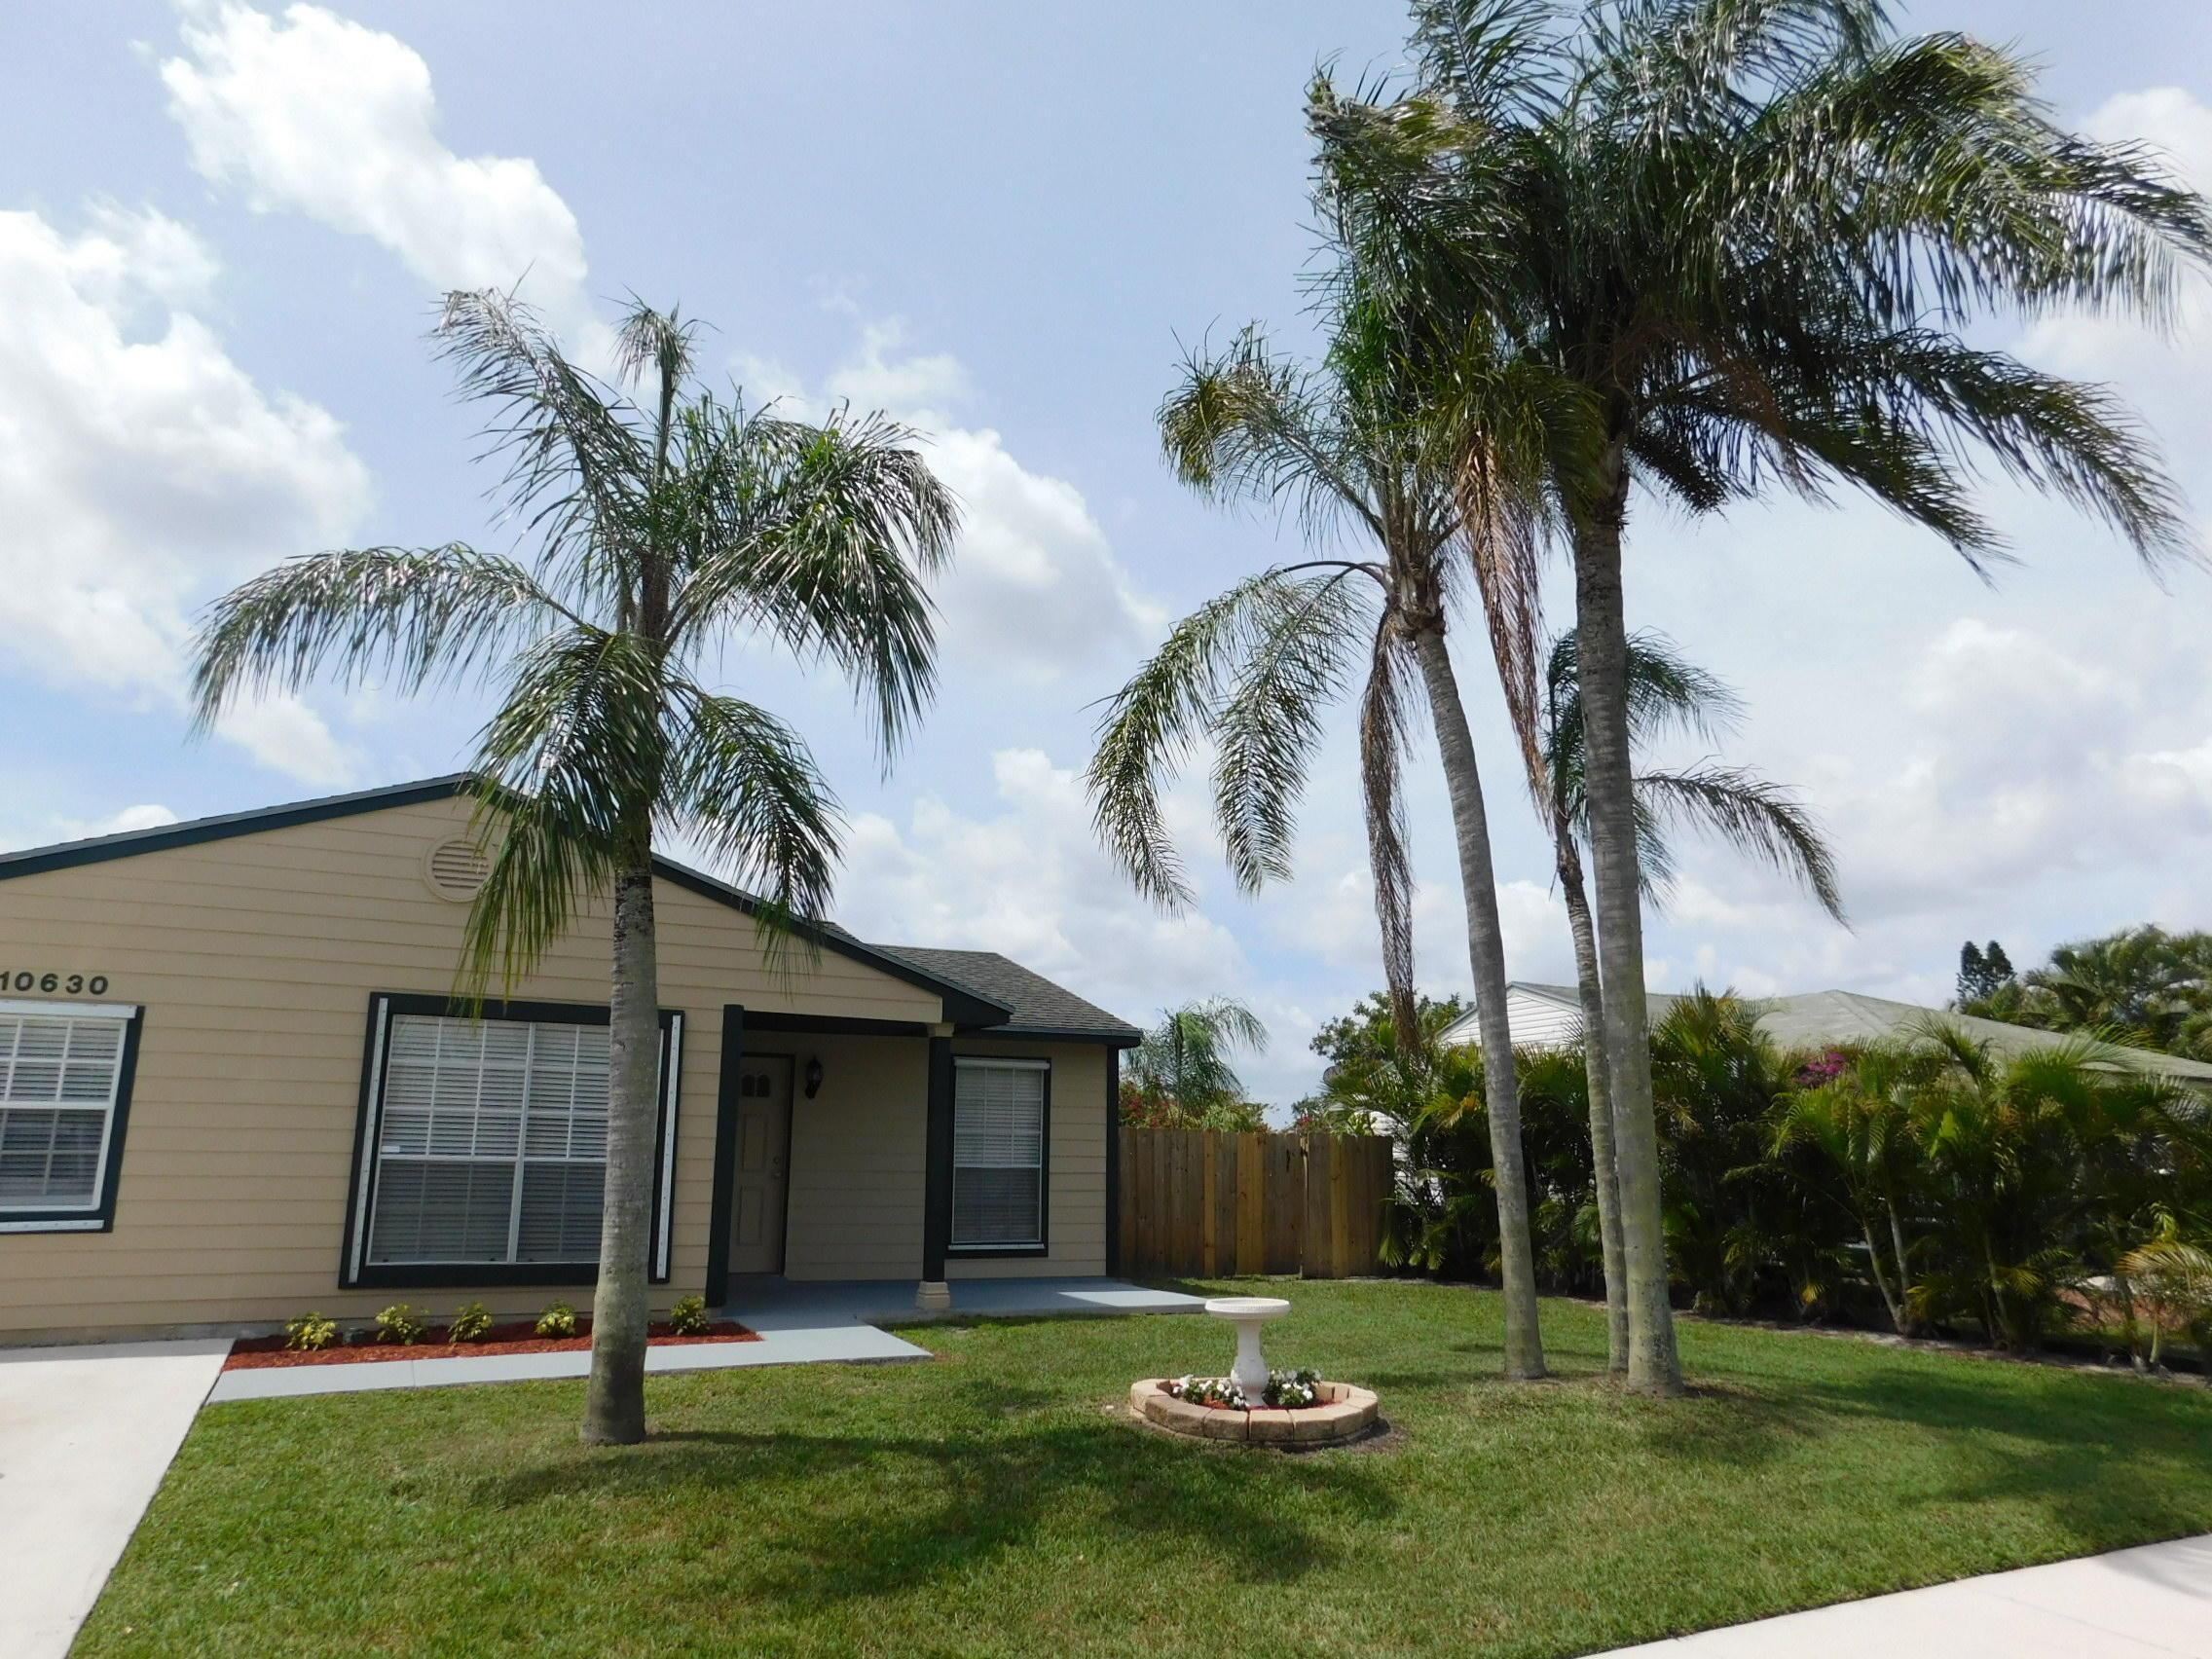 10630 Fascination Lane, Royal Palm Beach, Florida